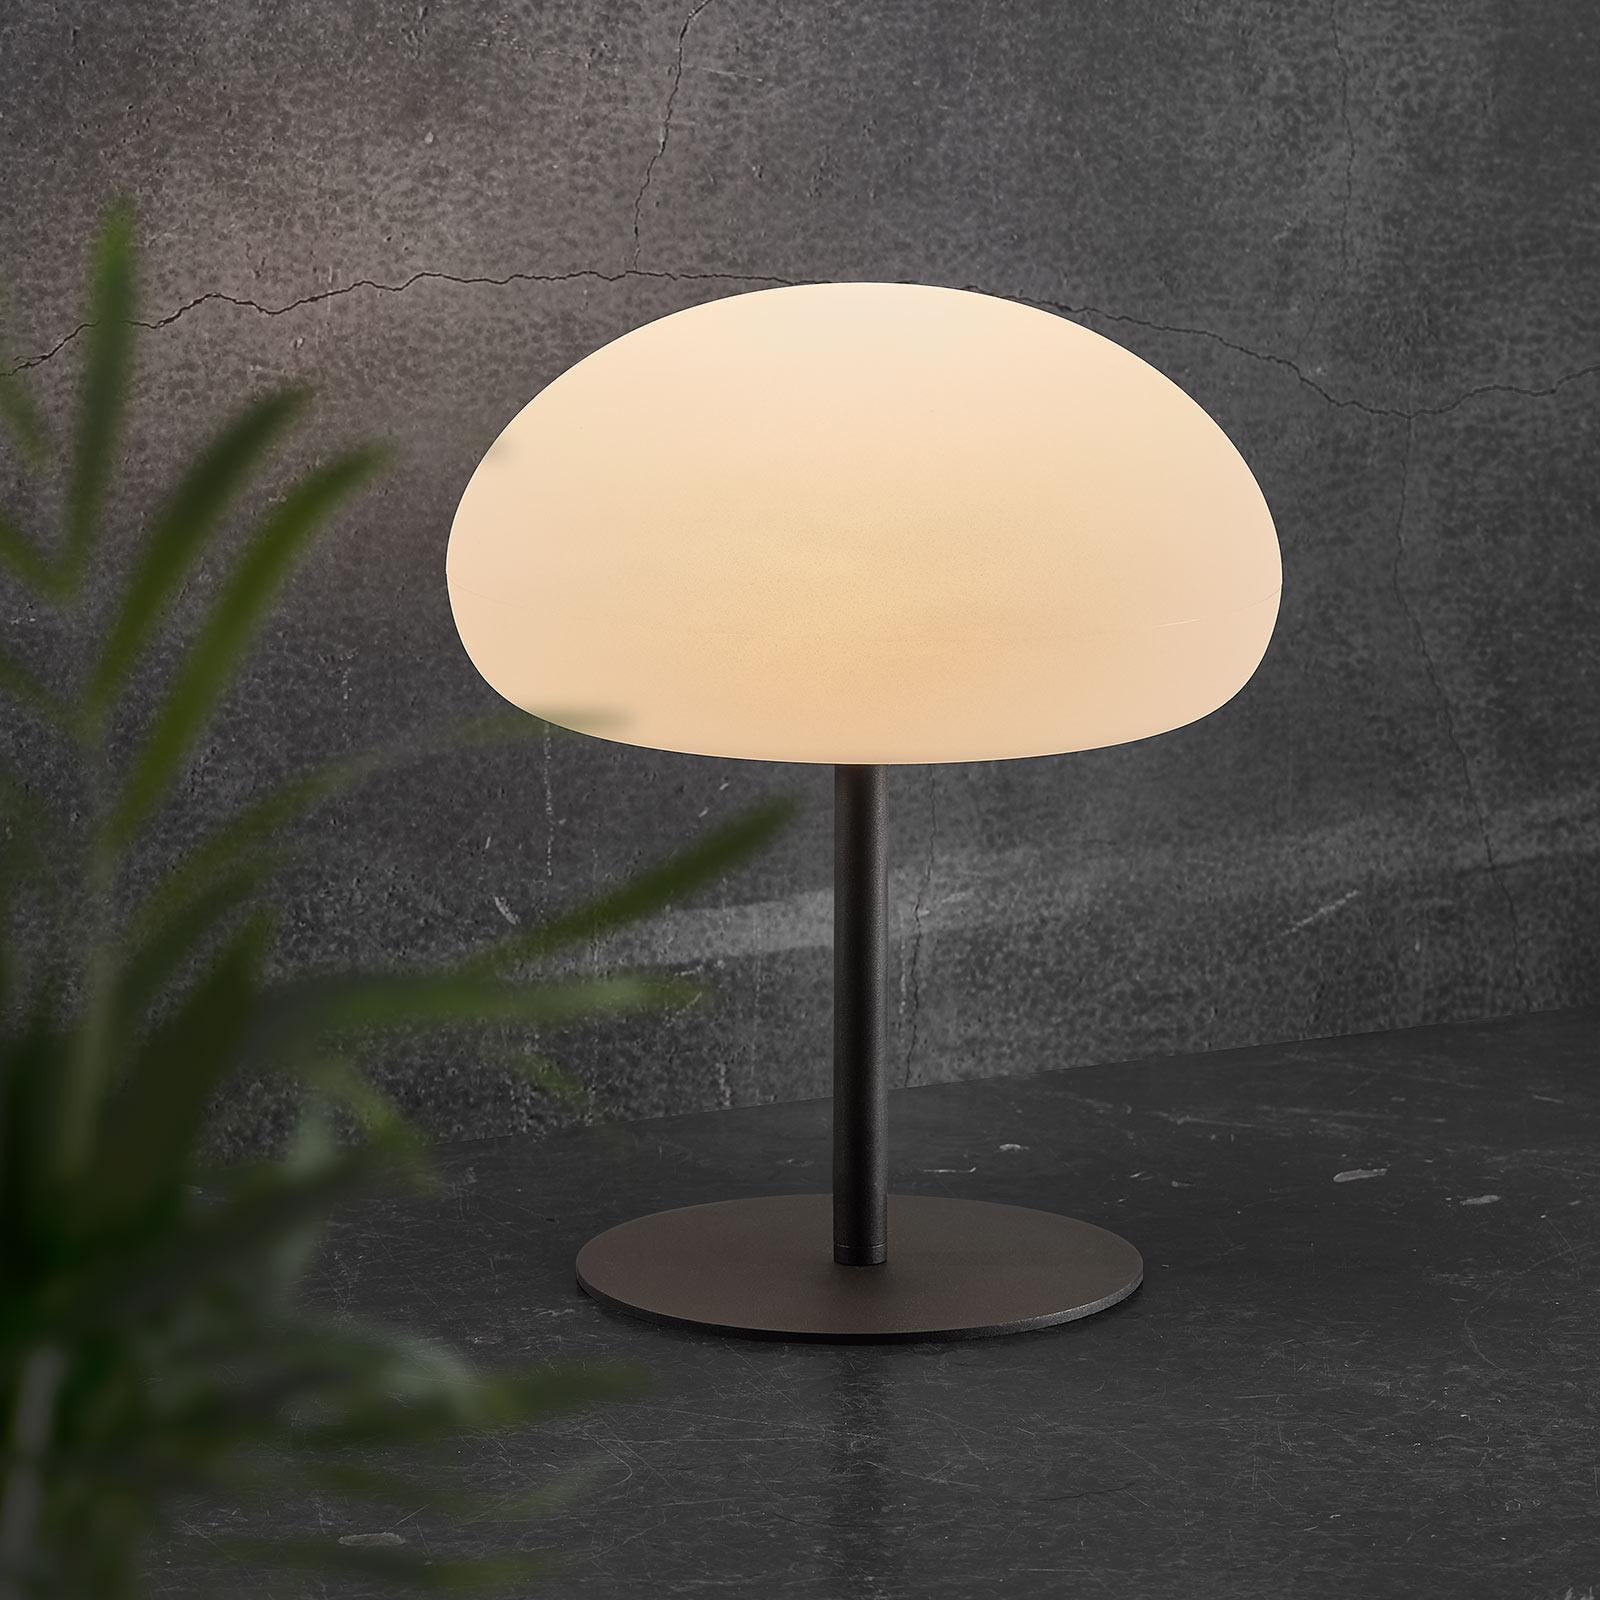 LED stolní lampa Sponge table, baterie 40,5 cm